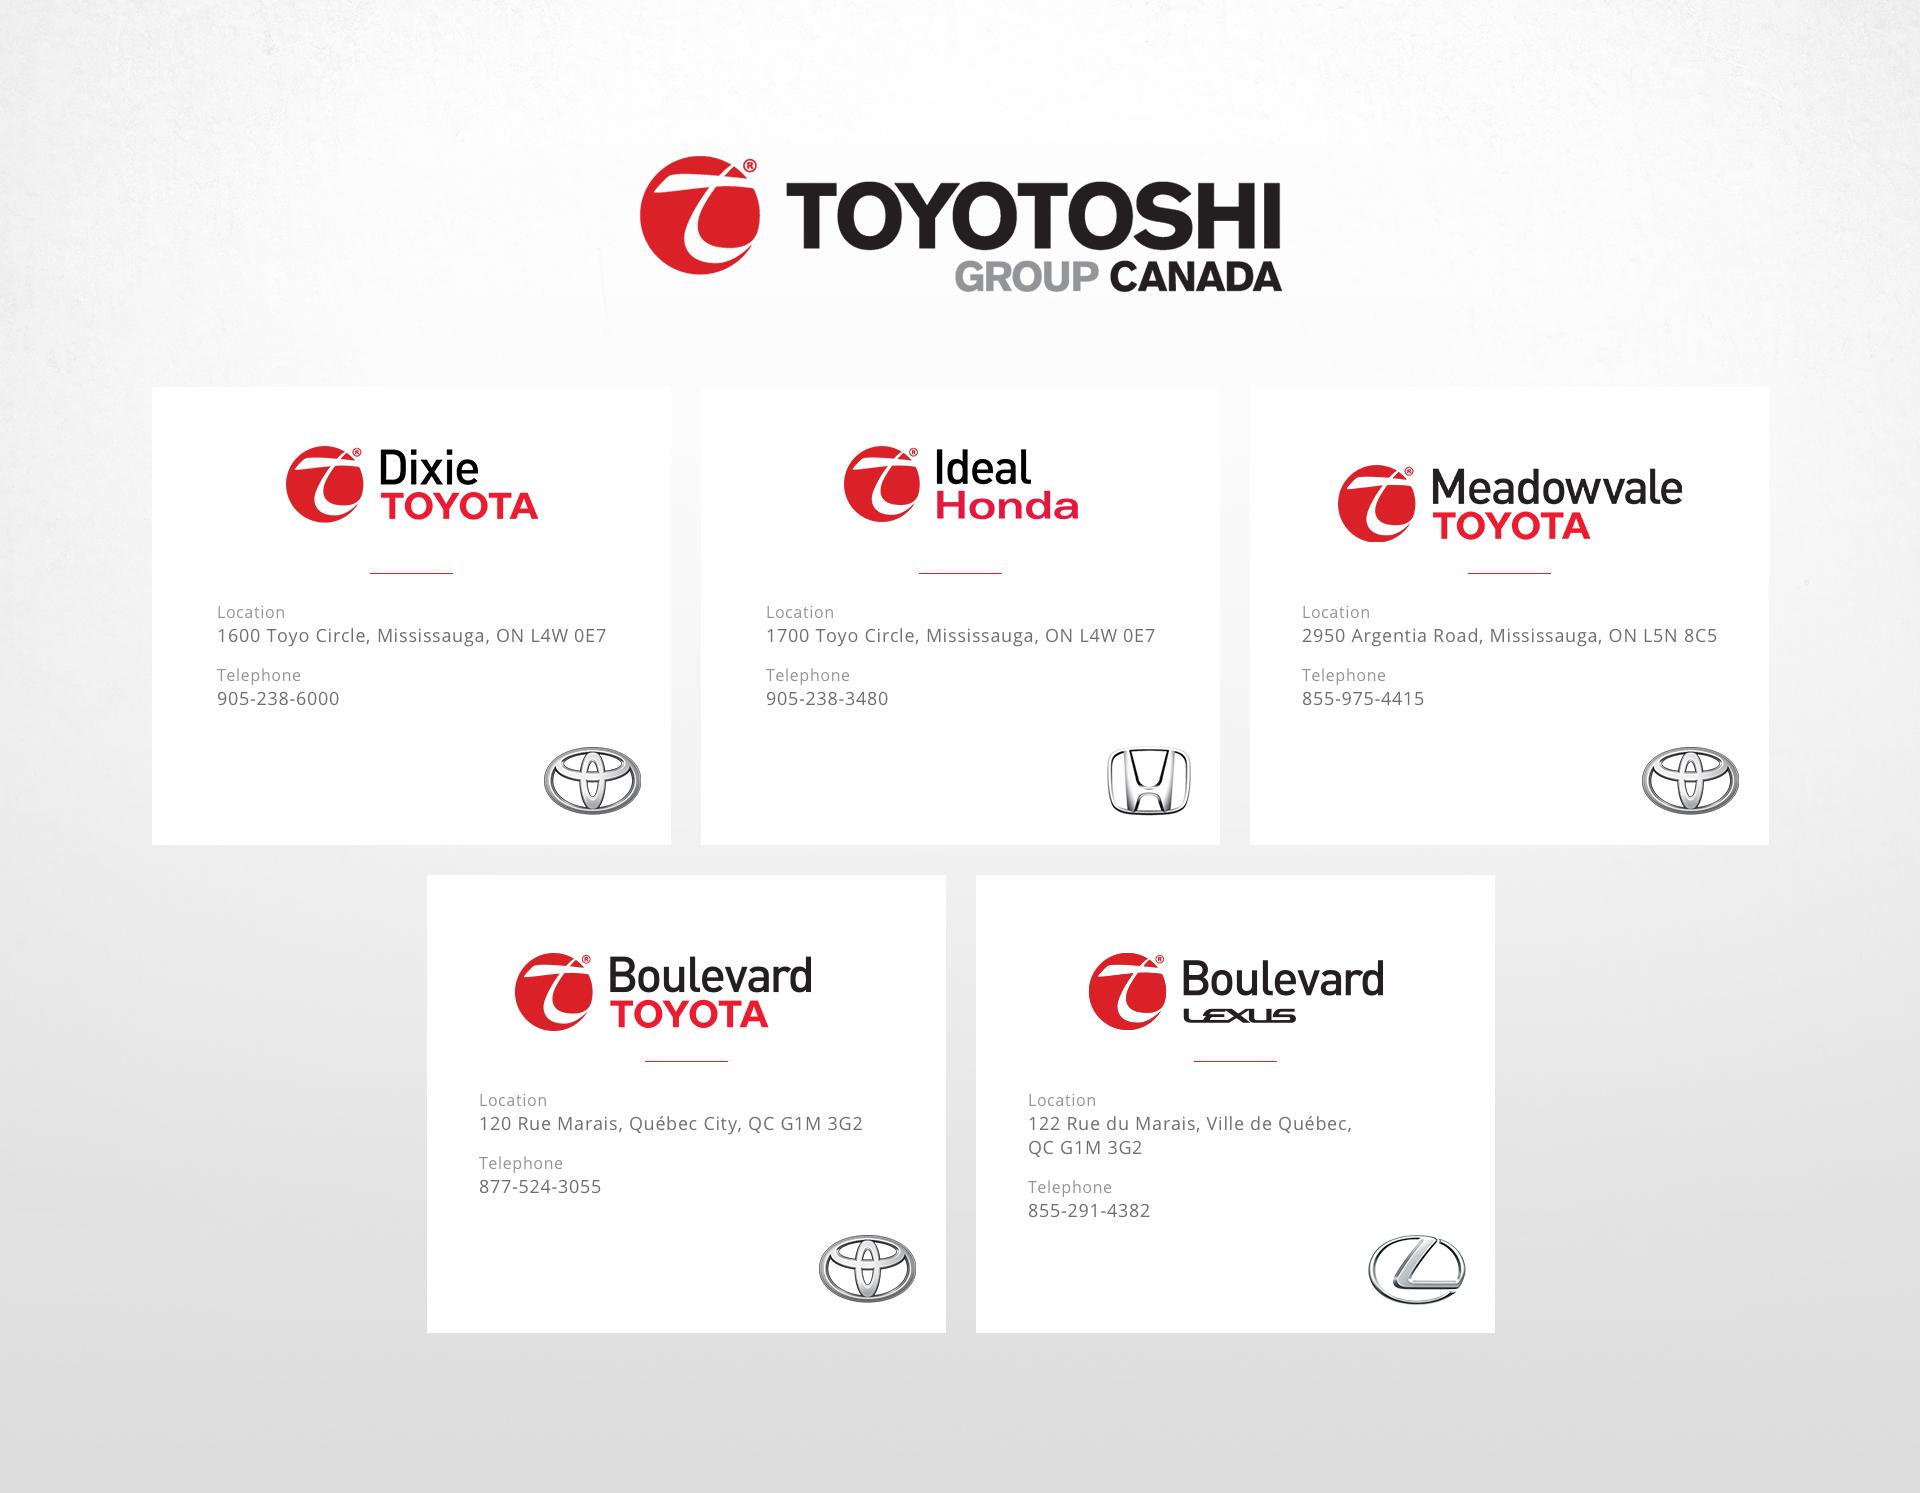 Toyotoshi Canada